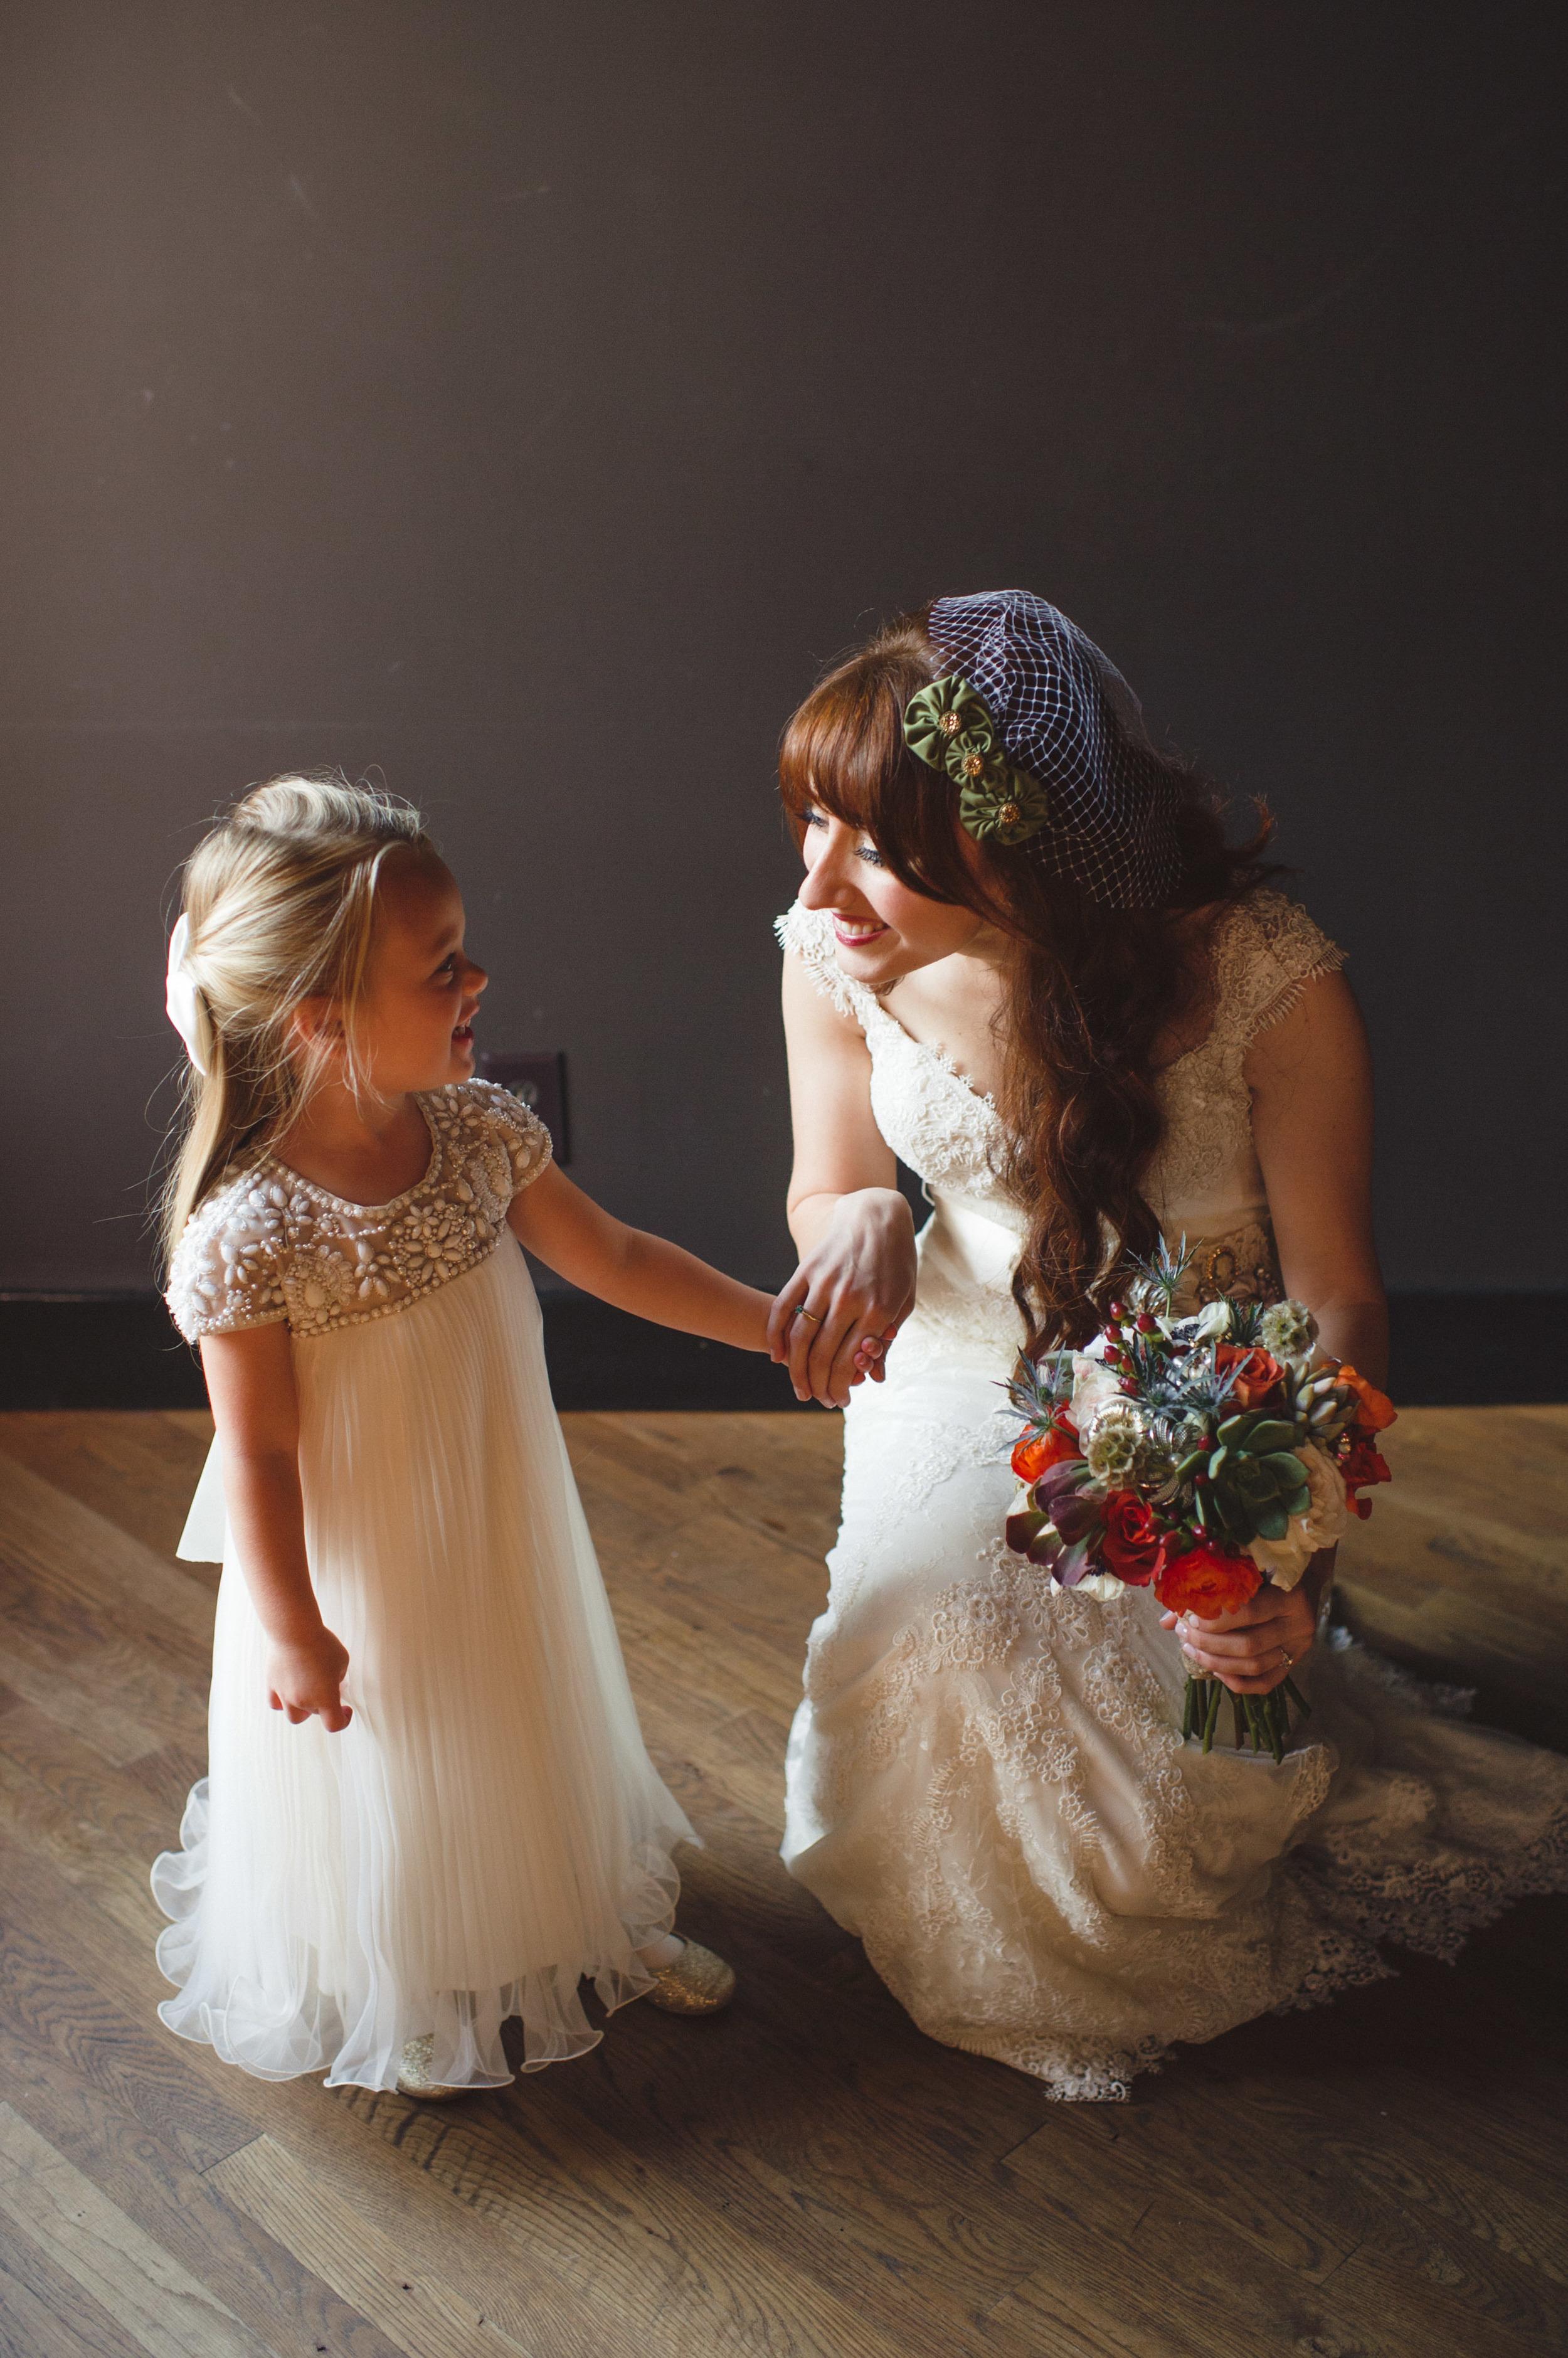 October Bride and Flower Girl